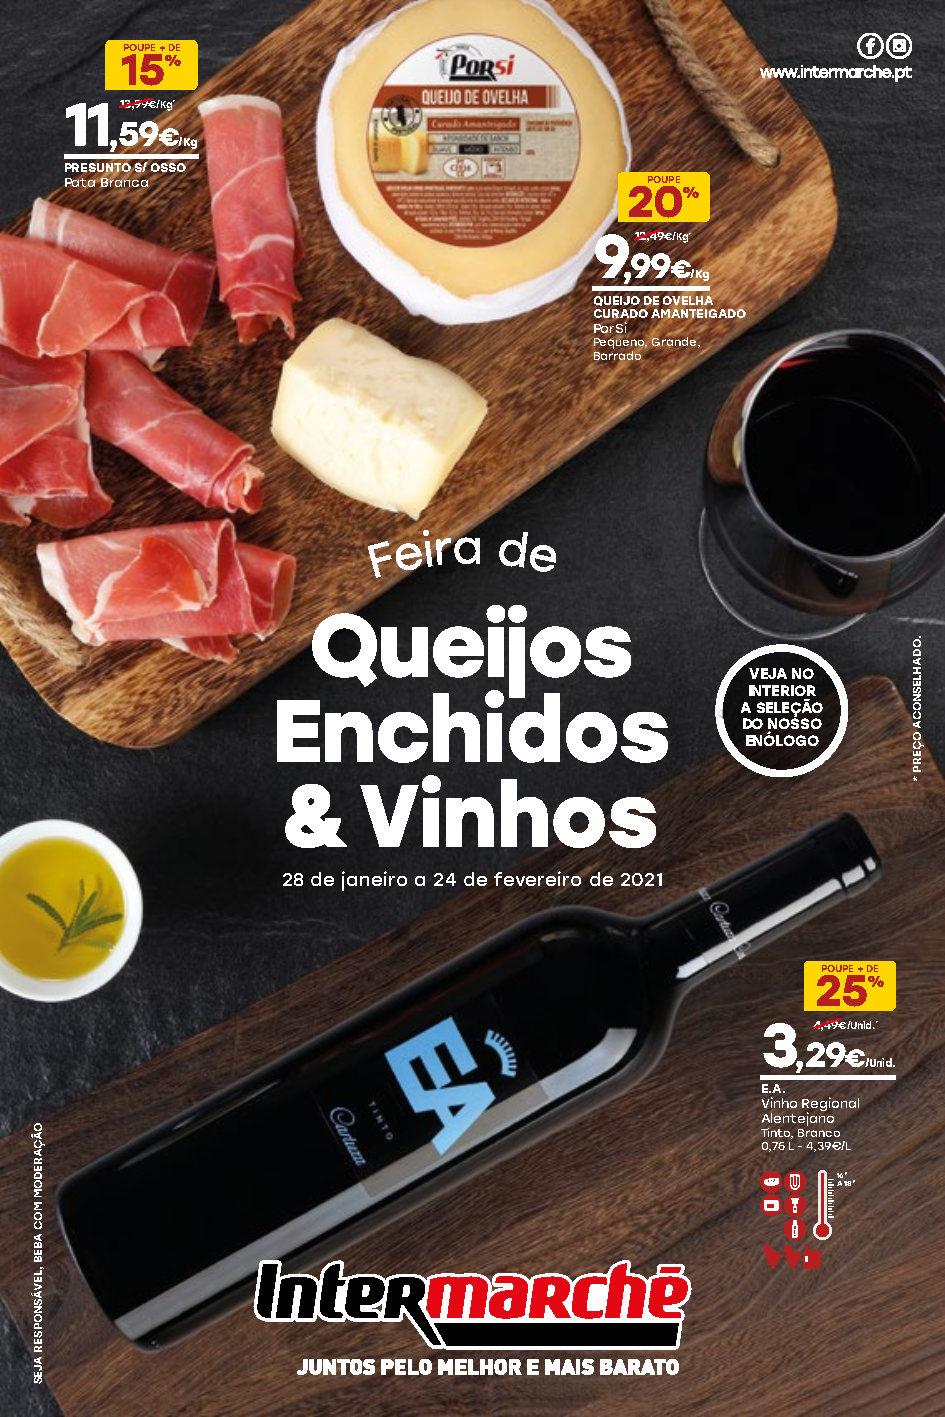 vinhos intermarche Page1